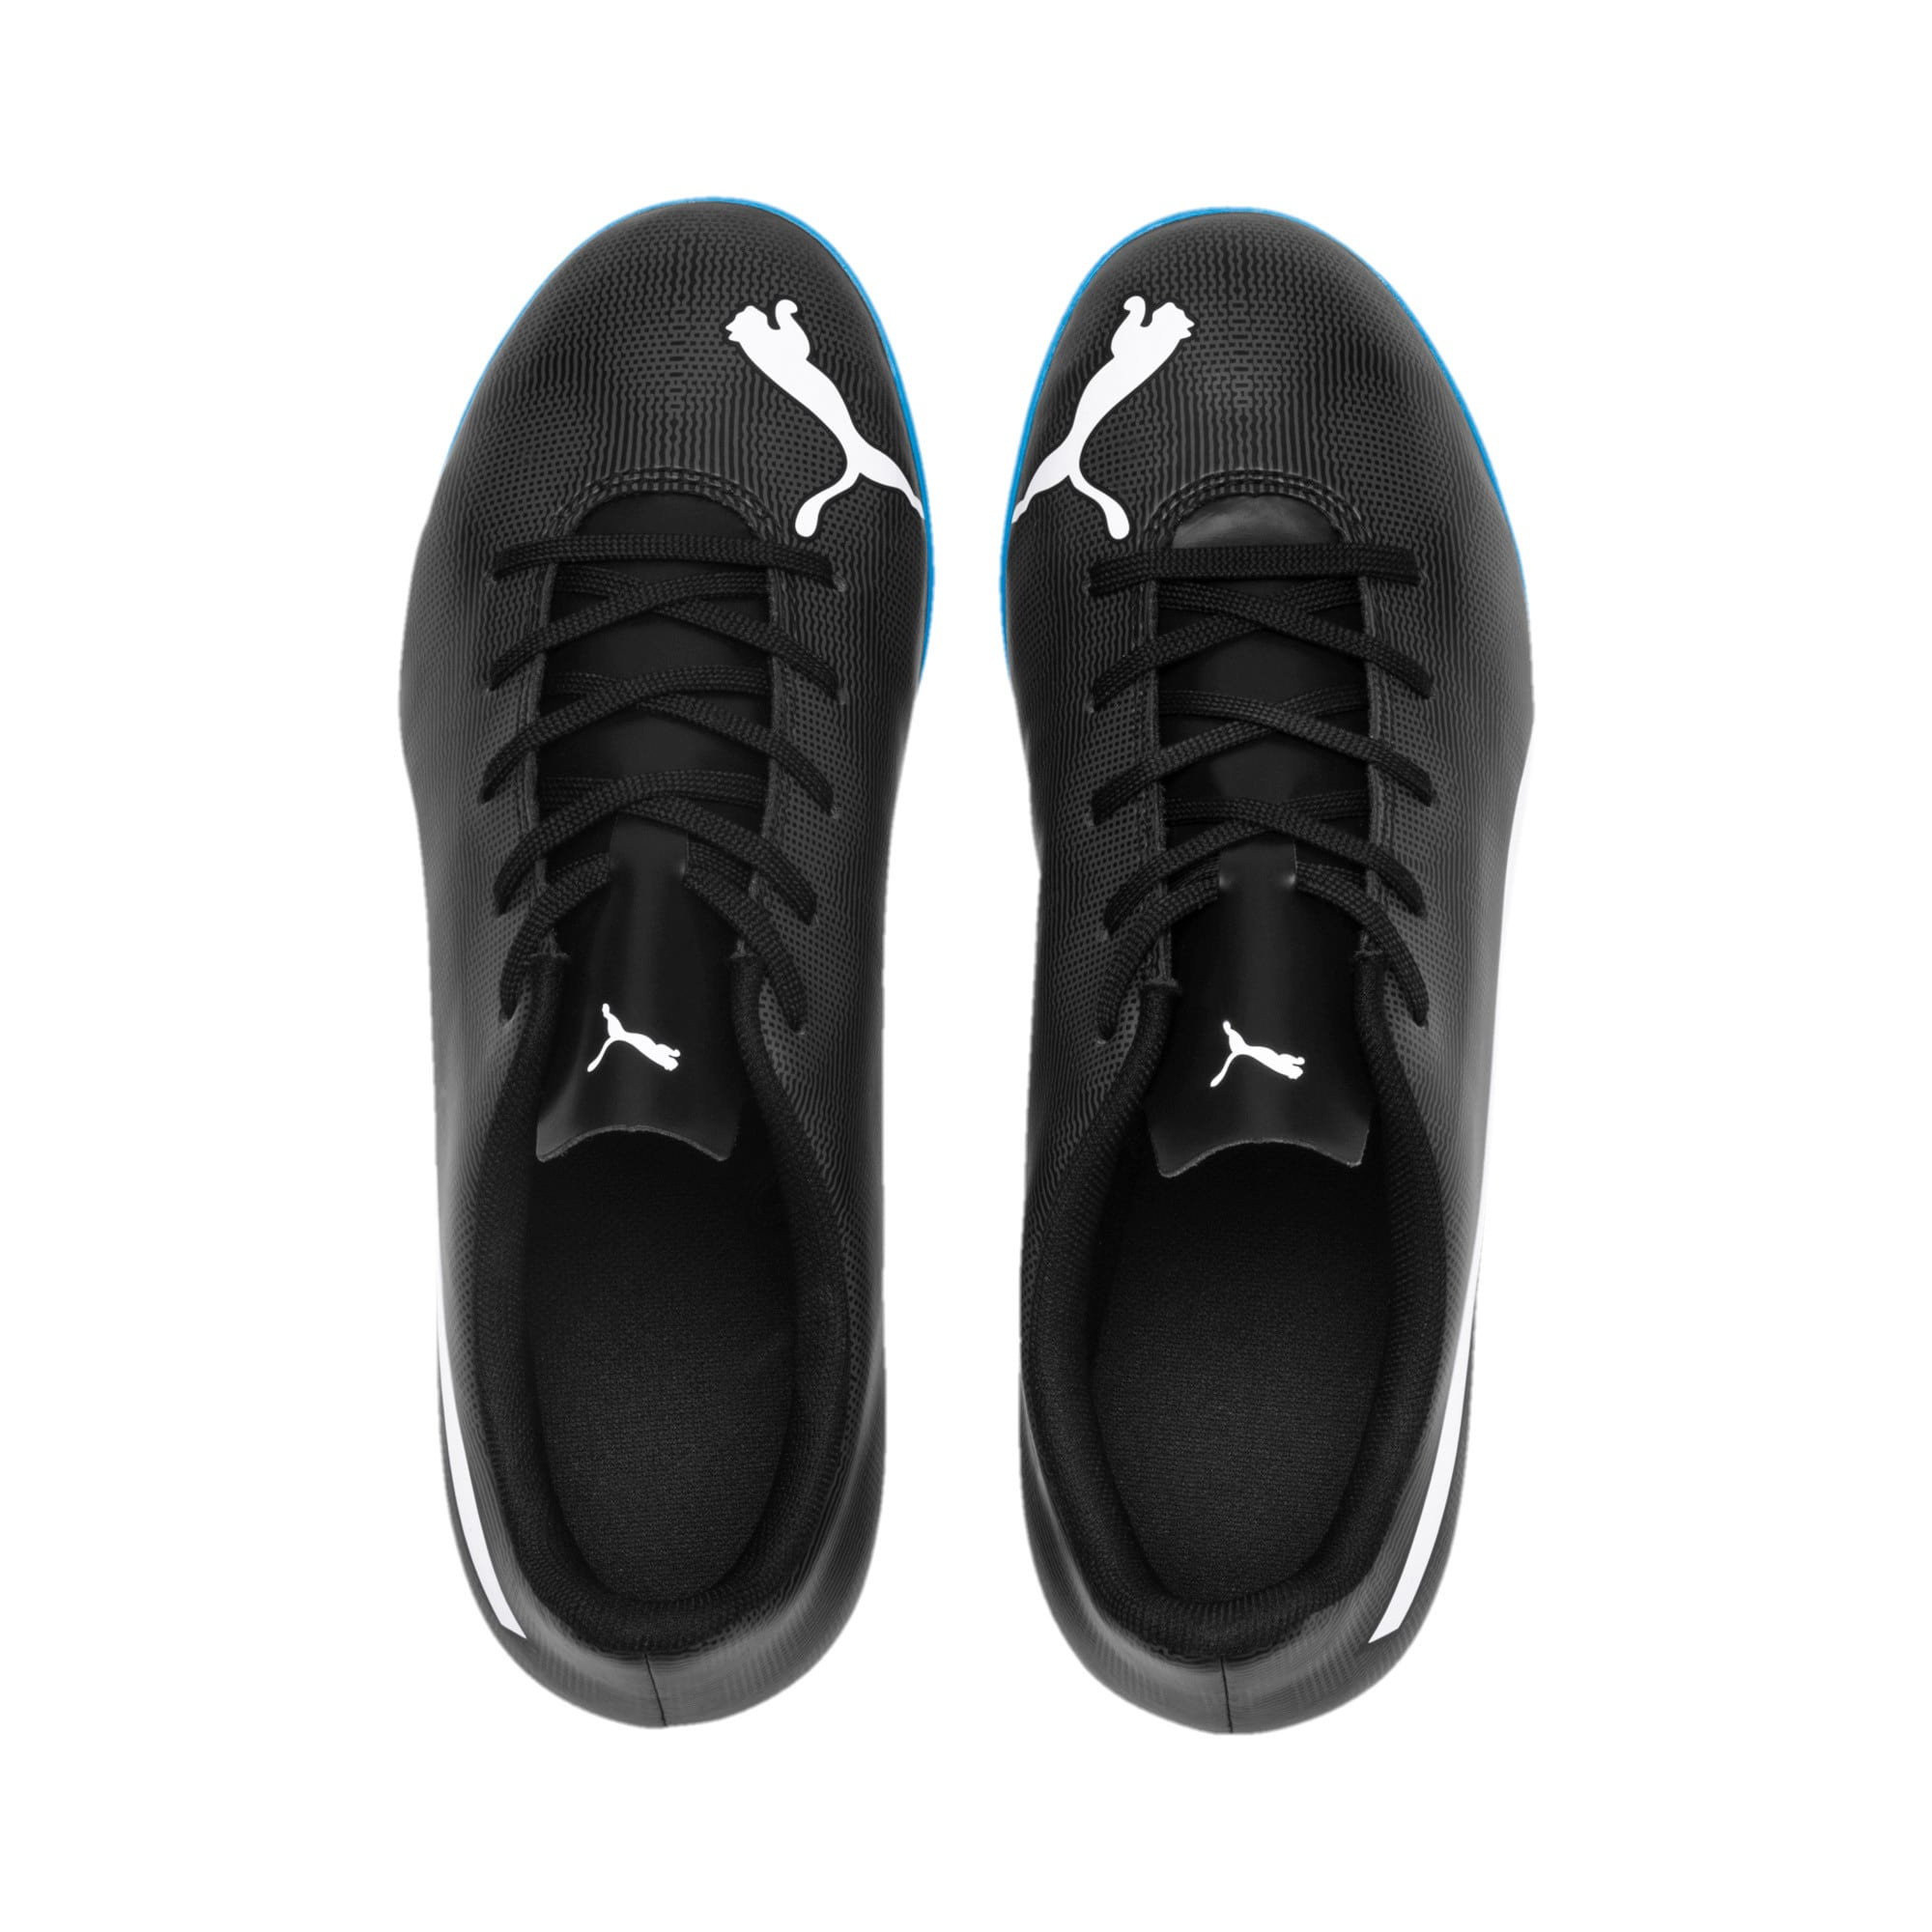 Thumbnail 6 of Rapido TT Youth Football Boots, Black-White-Iron Gate-Bleu, medium-IND